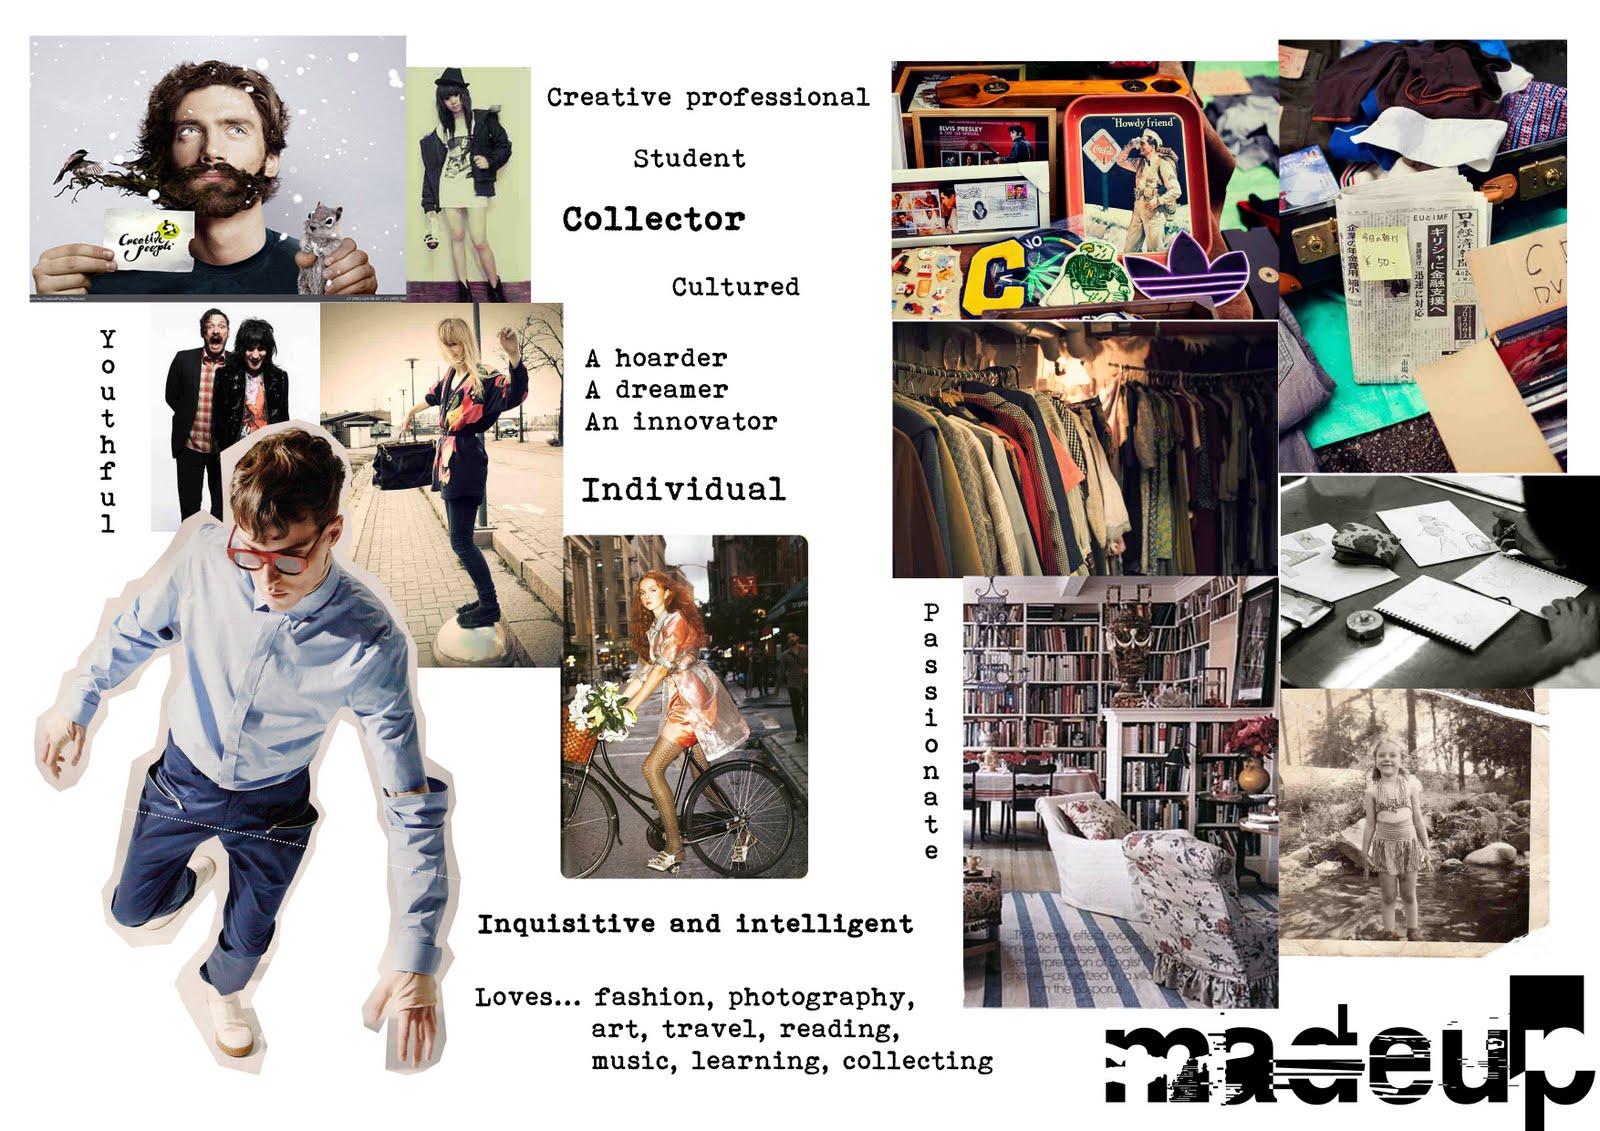 madeup magazine madeup magazine target consumer profile. Black Bedroom Furniture Sets. Home Design Ideas